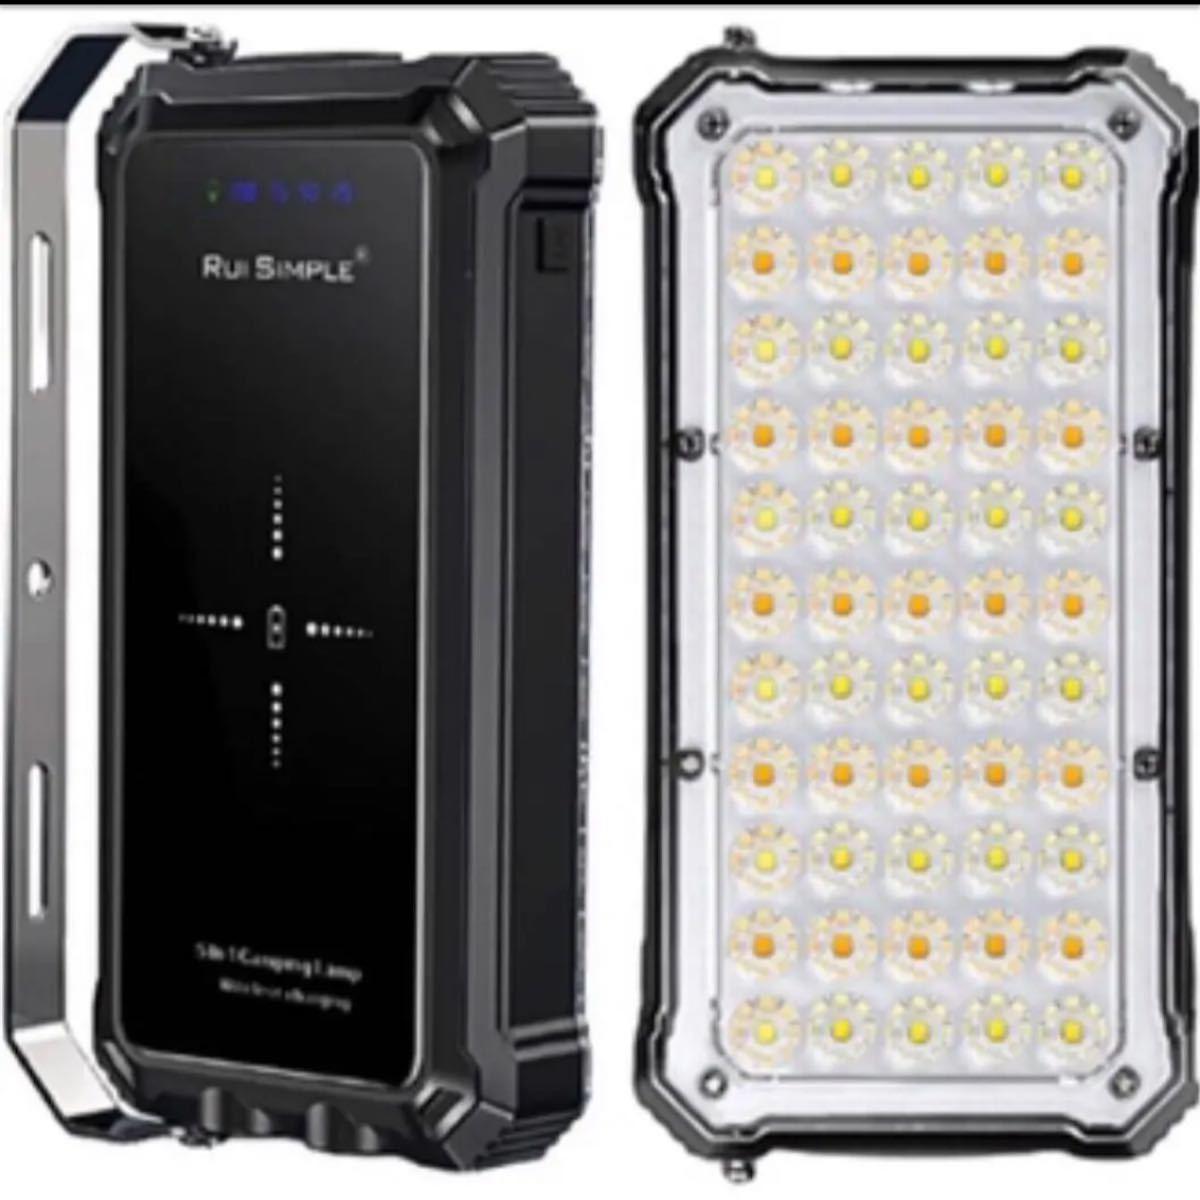 LED ランタン キャンプライト USB充電式 キャンプランタン 20000mAh LED ライト 懐中電灯 キャンプ用品